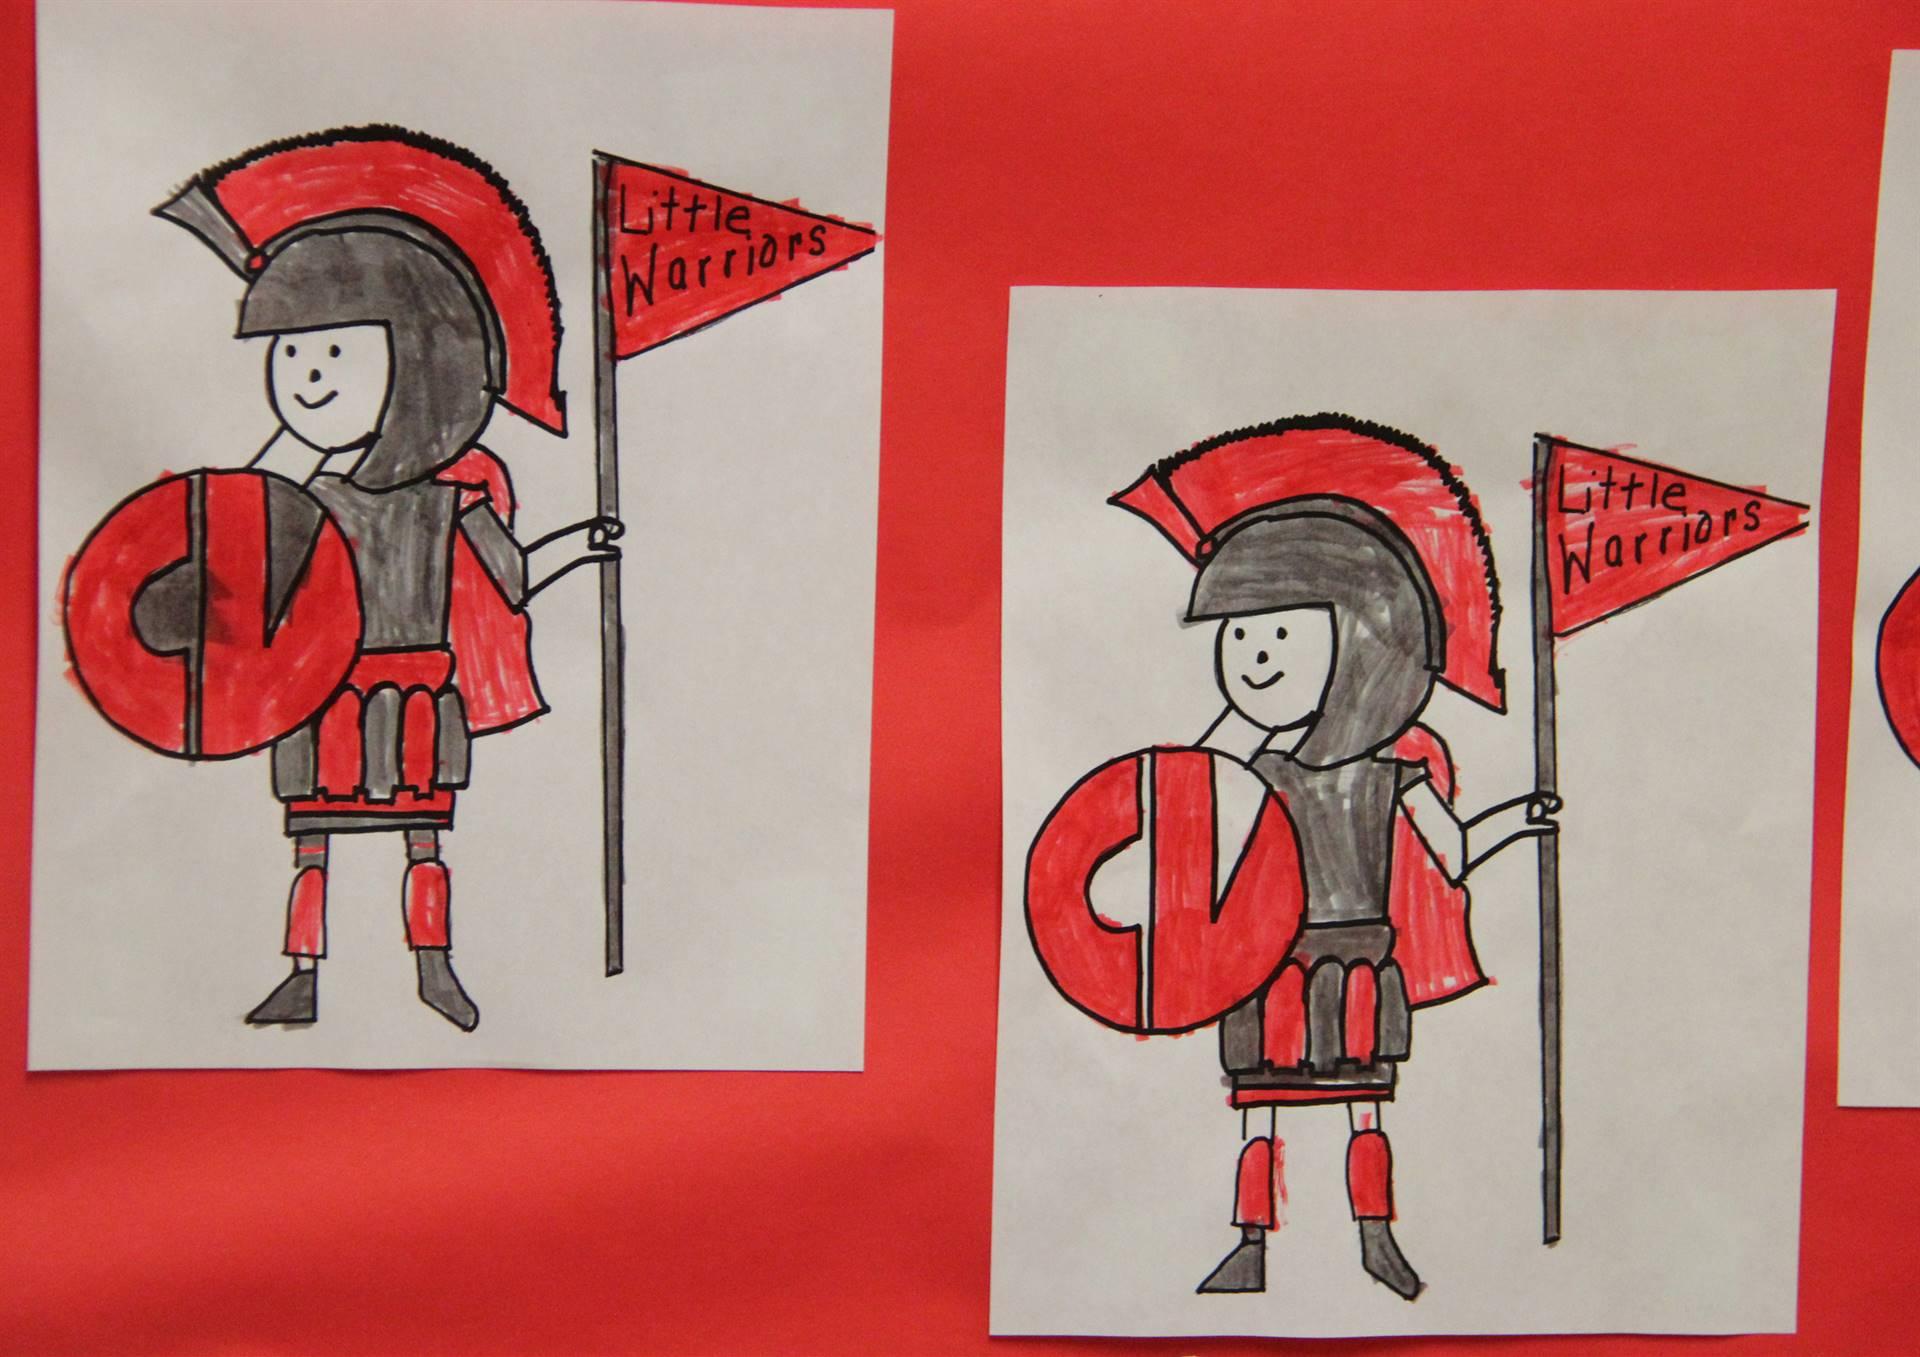 little warrior illustrations